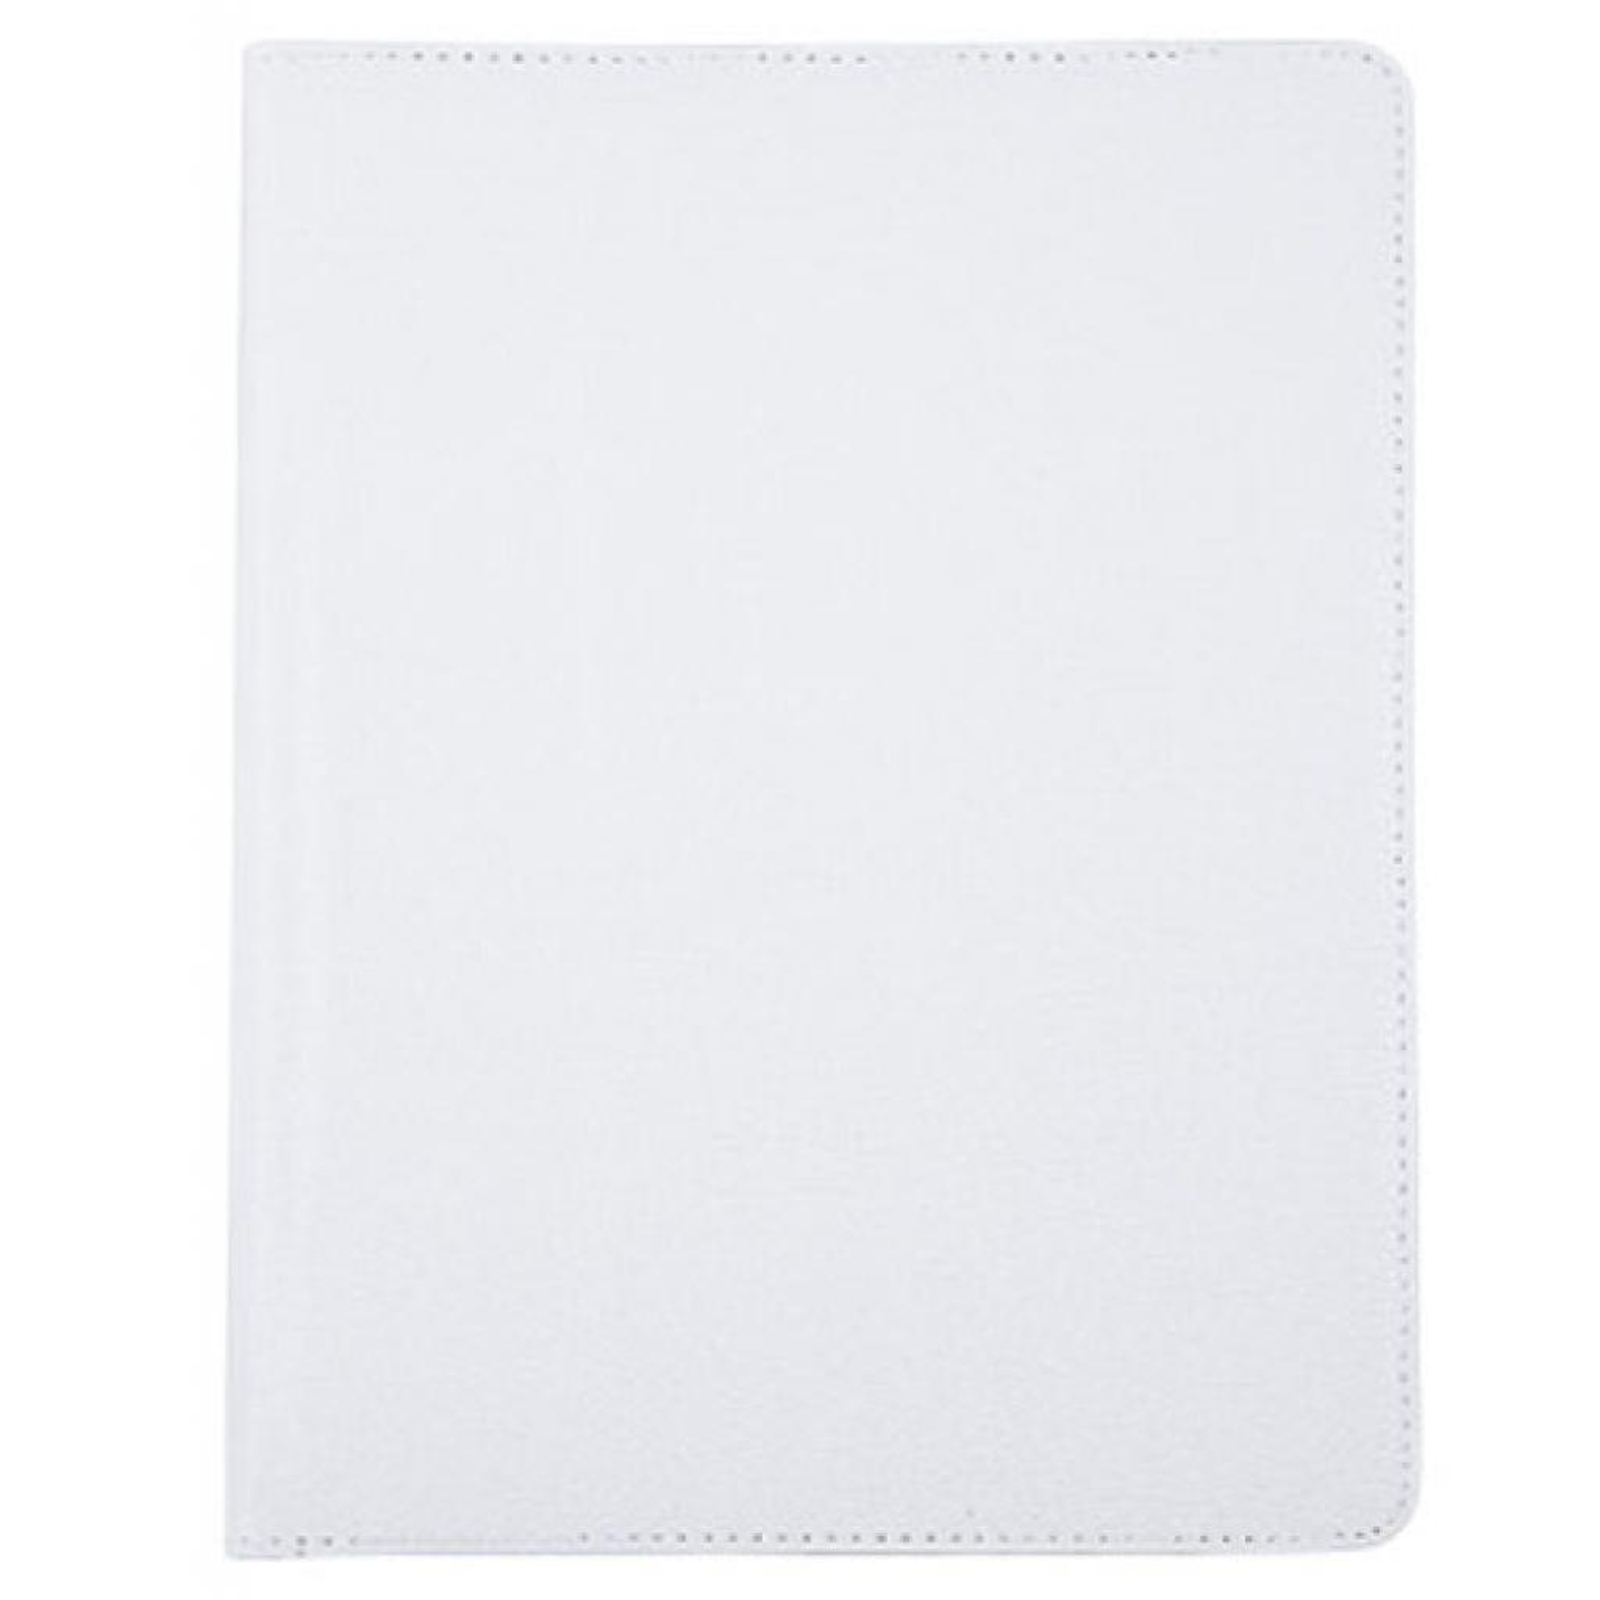 "Чехол для планшета Drobak 7""-8"" Universal Stand White (216891) изображение 2"